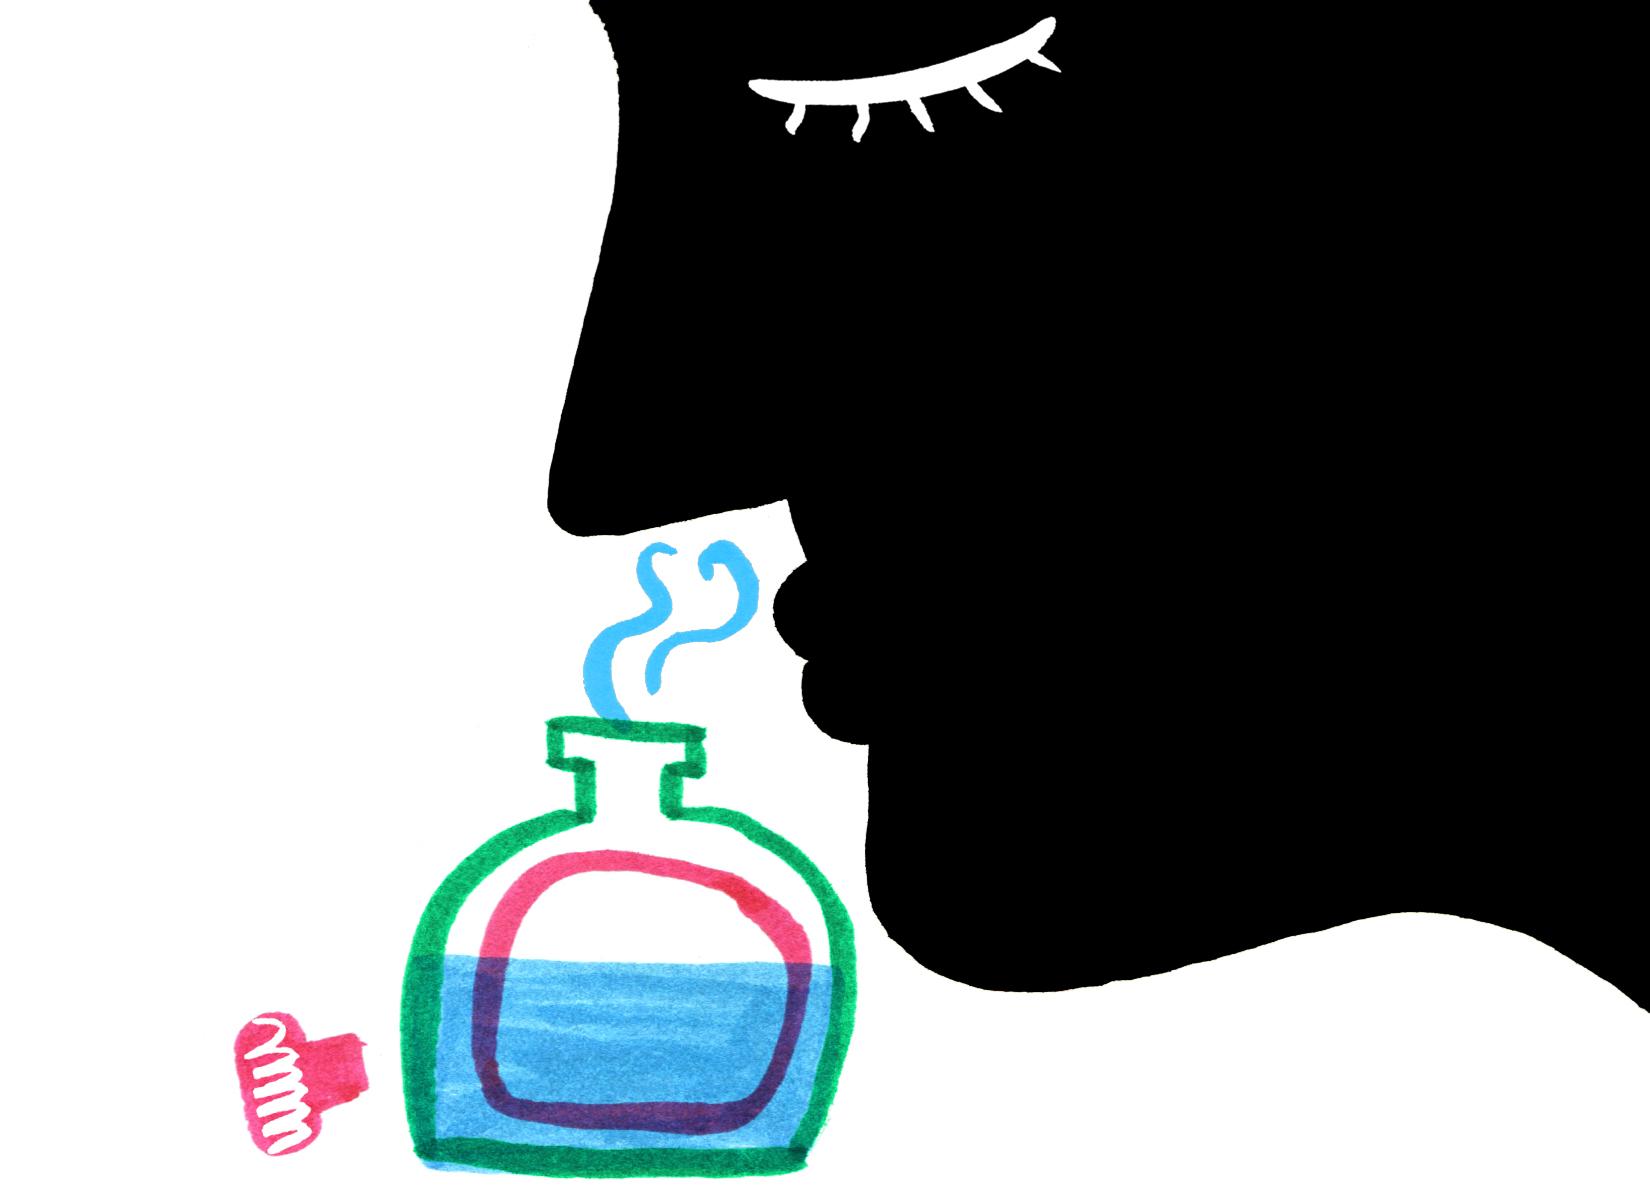 scent2 copy 2.jpg